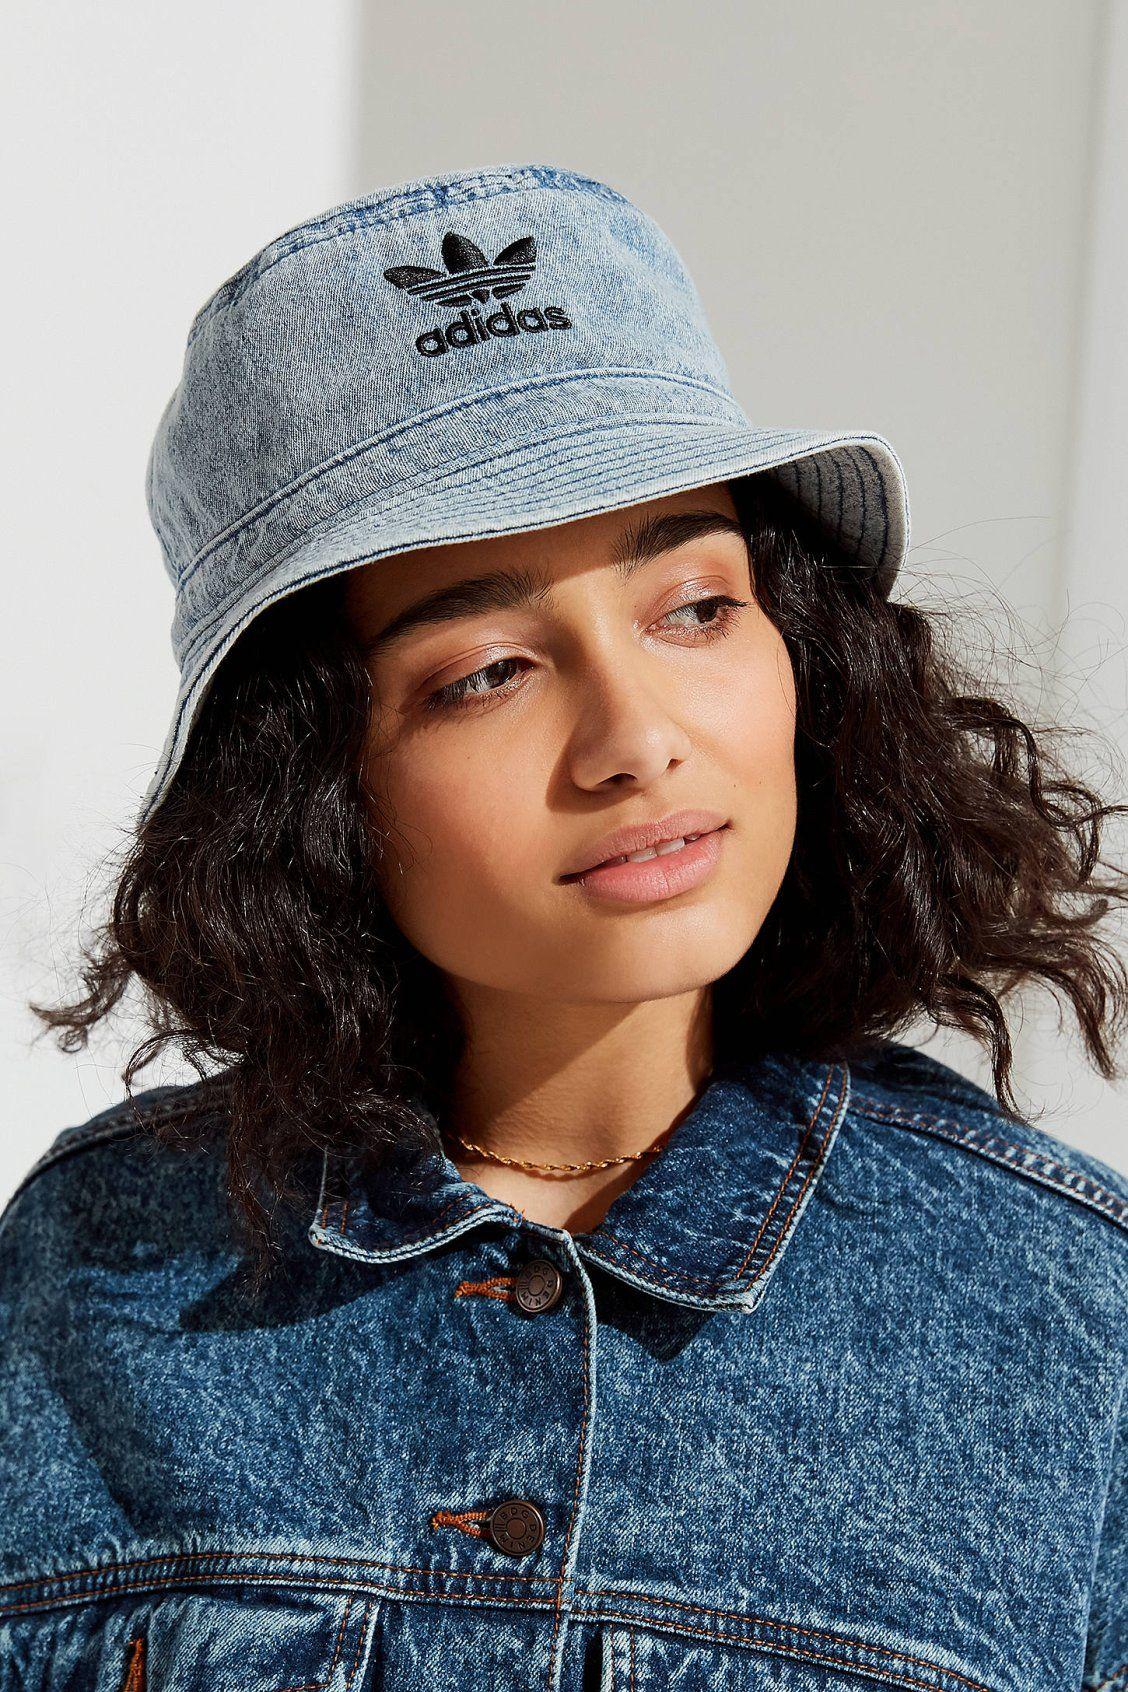 894ee764 adidas Originals Denim Bucket Hat | Tomboy | Hats, Denim hat, Adidas ...